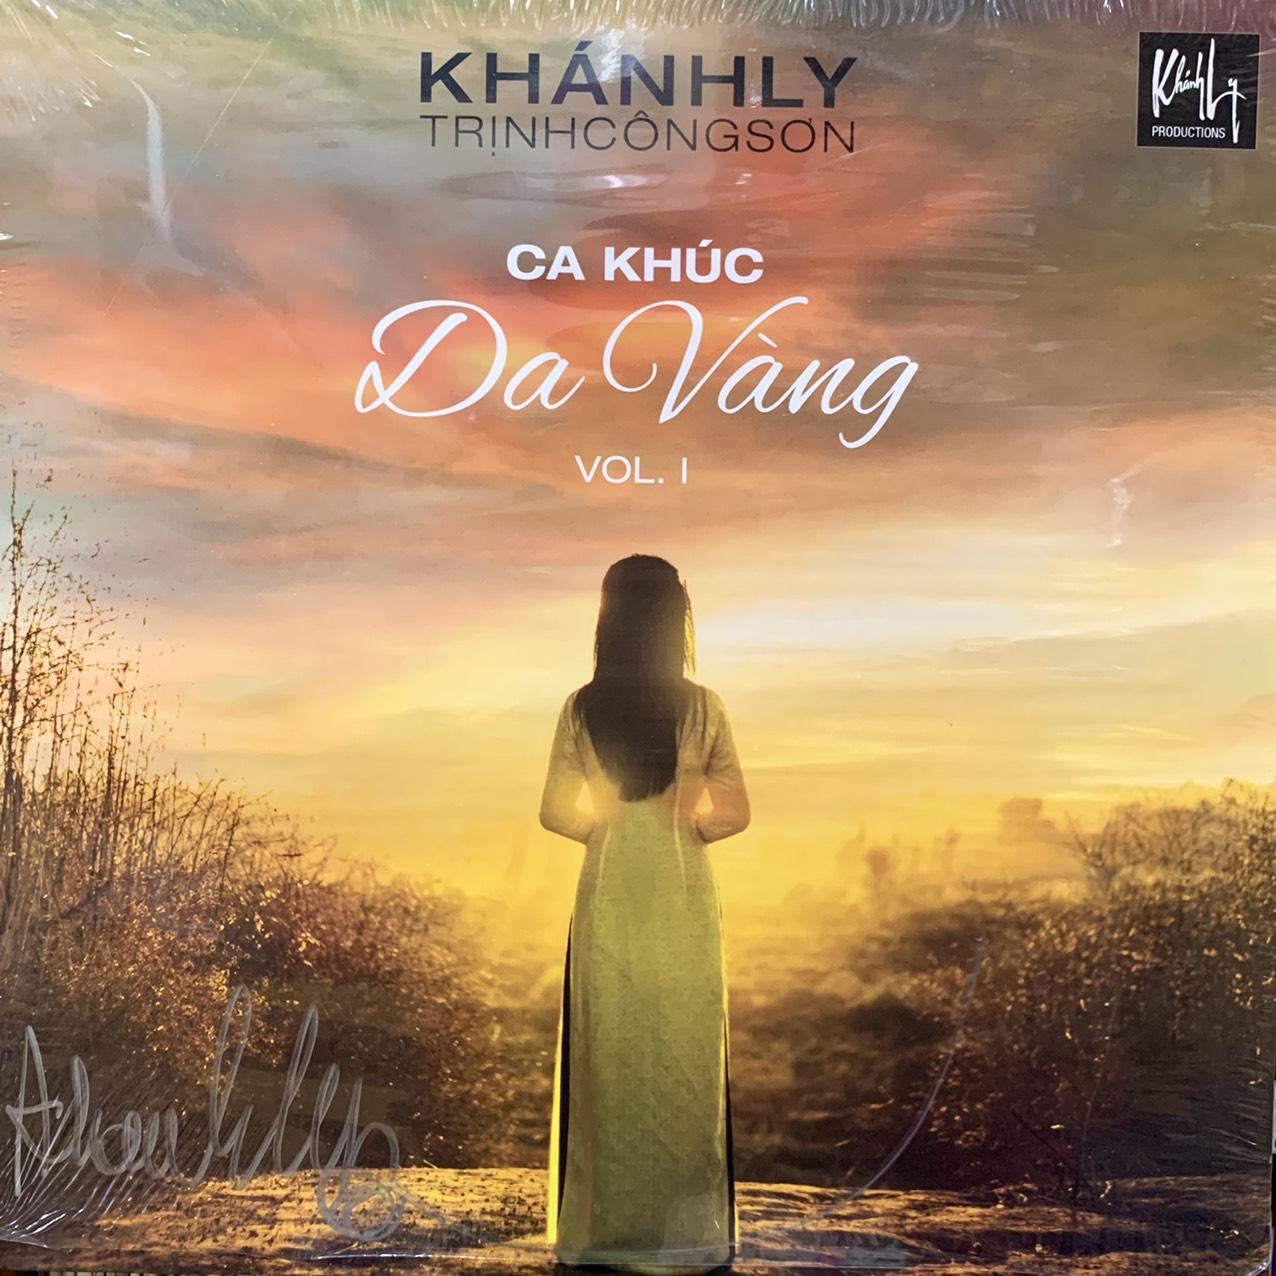 dia-than-ca-khuc-da-vang-vol-1-khanh-ky-trinh-cong-son